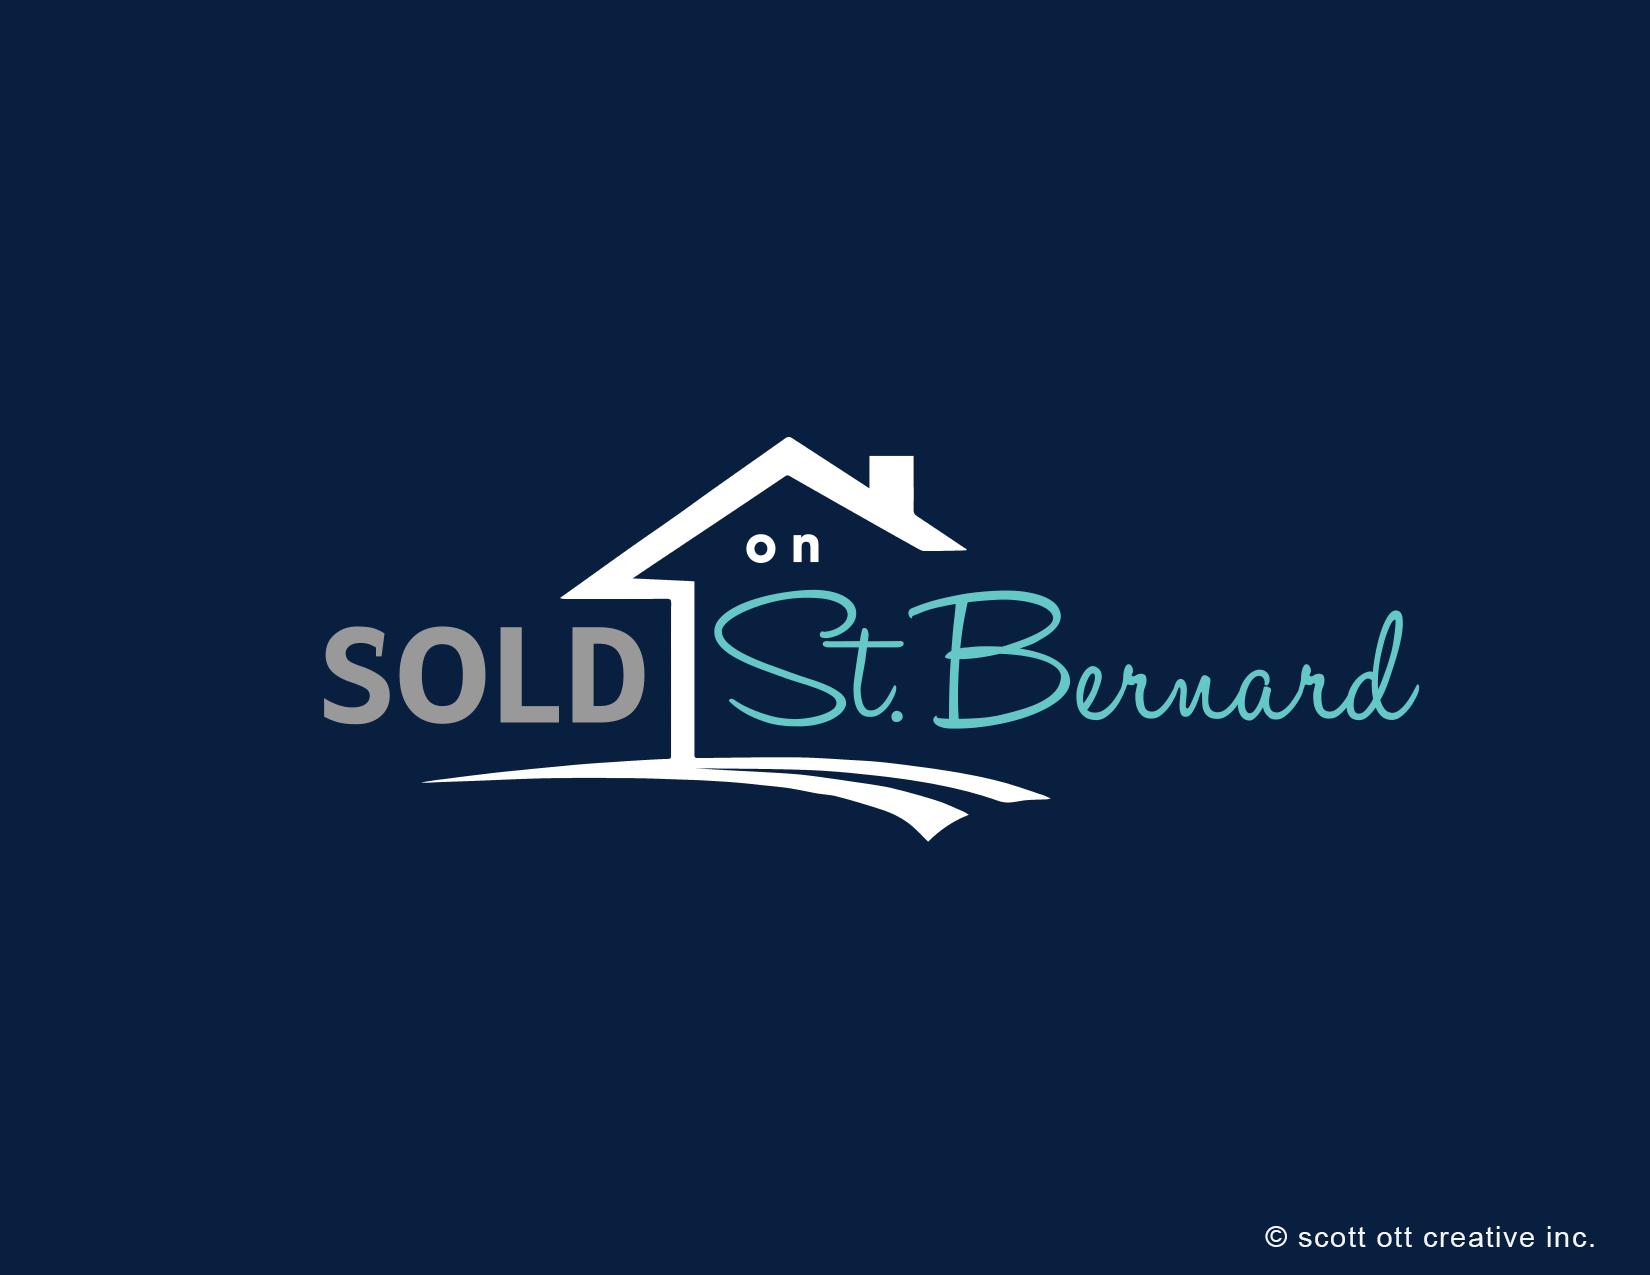 sold on st. bernard logo